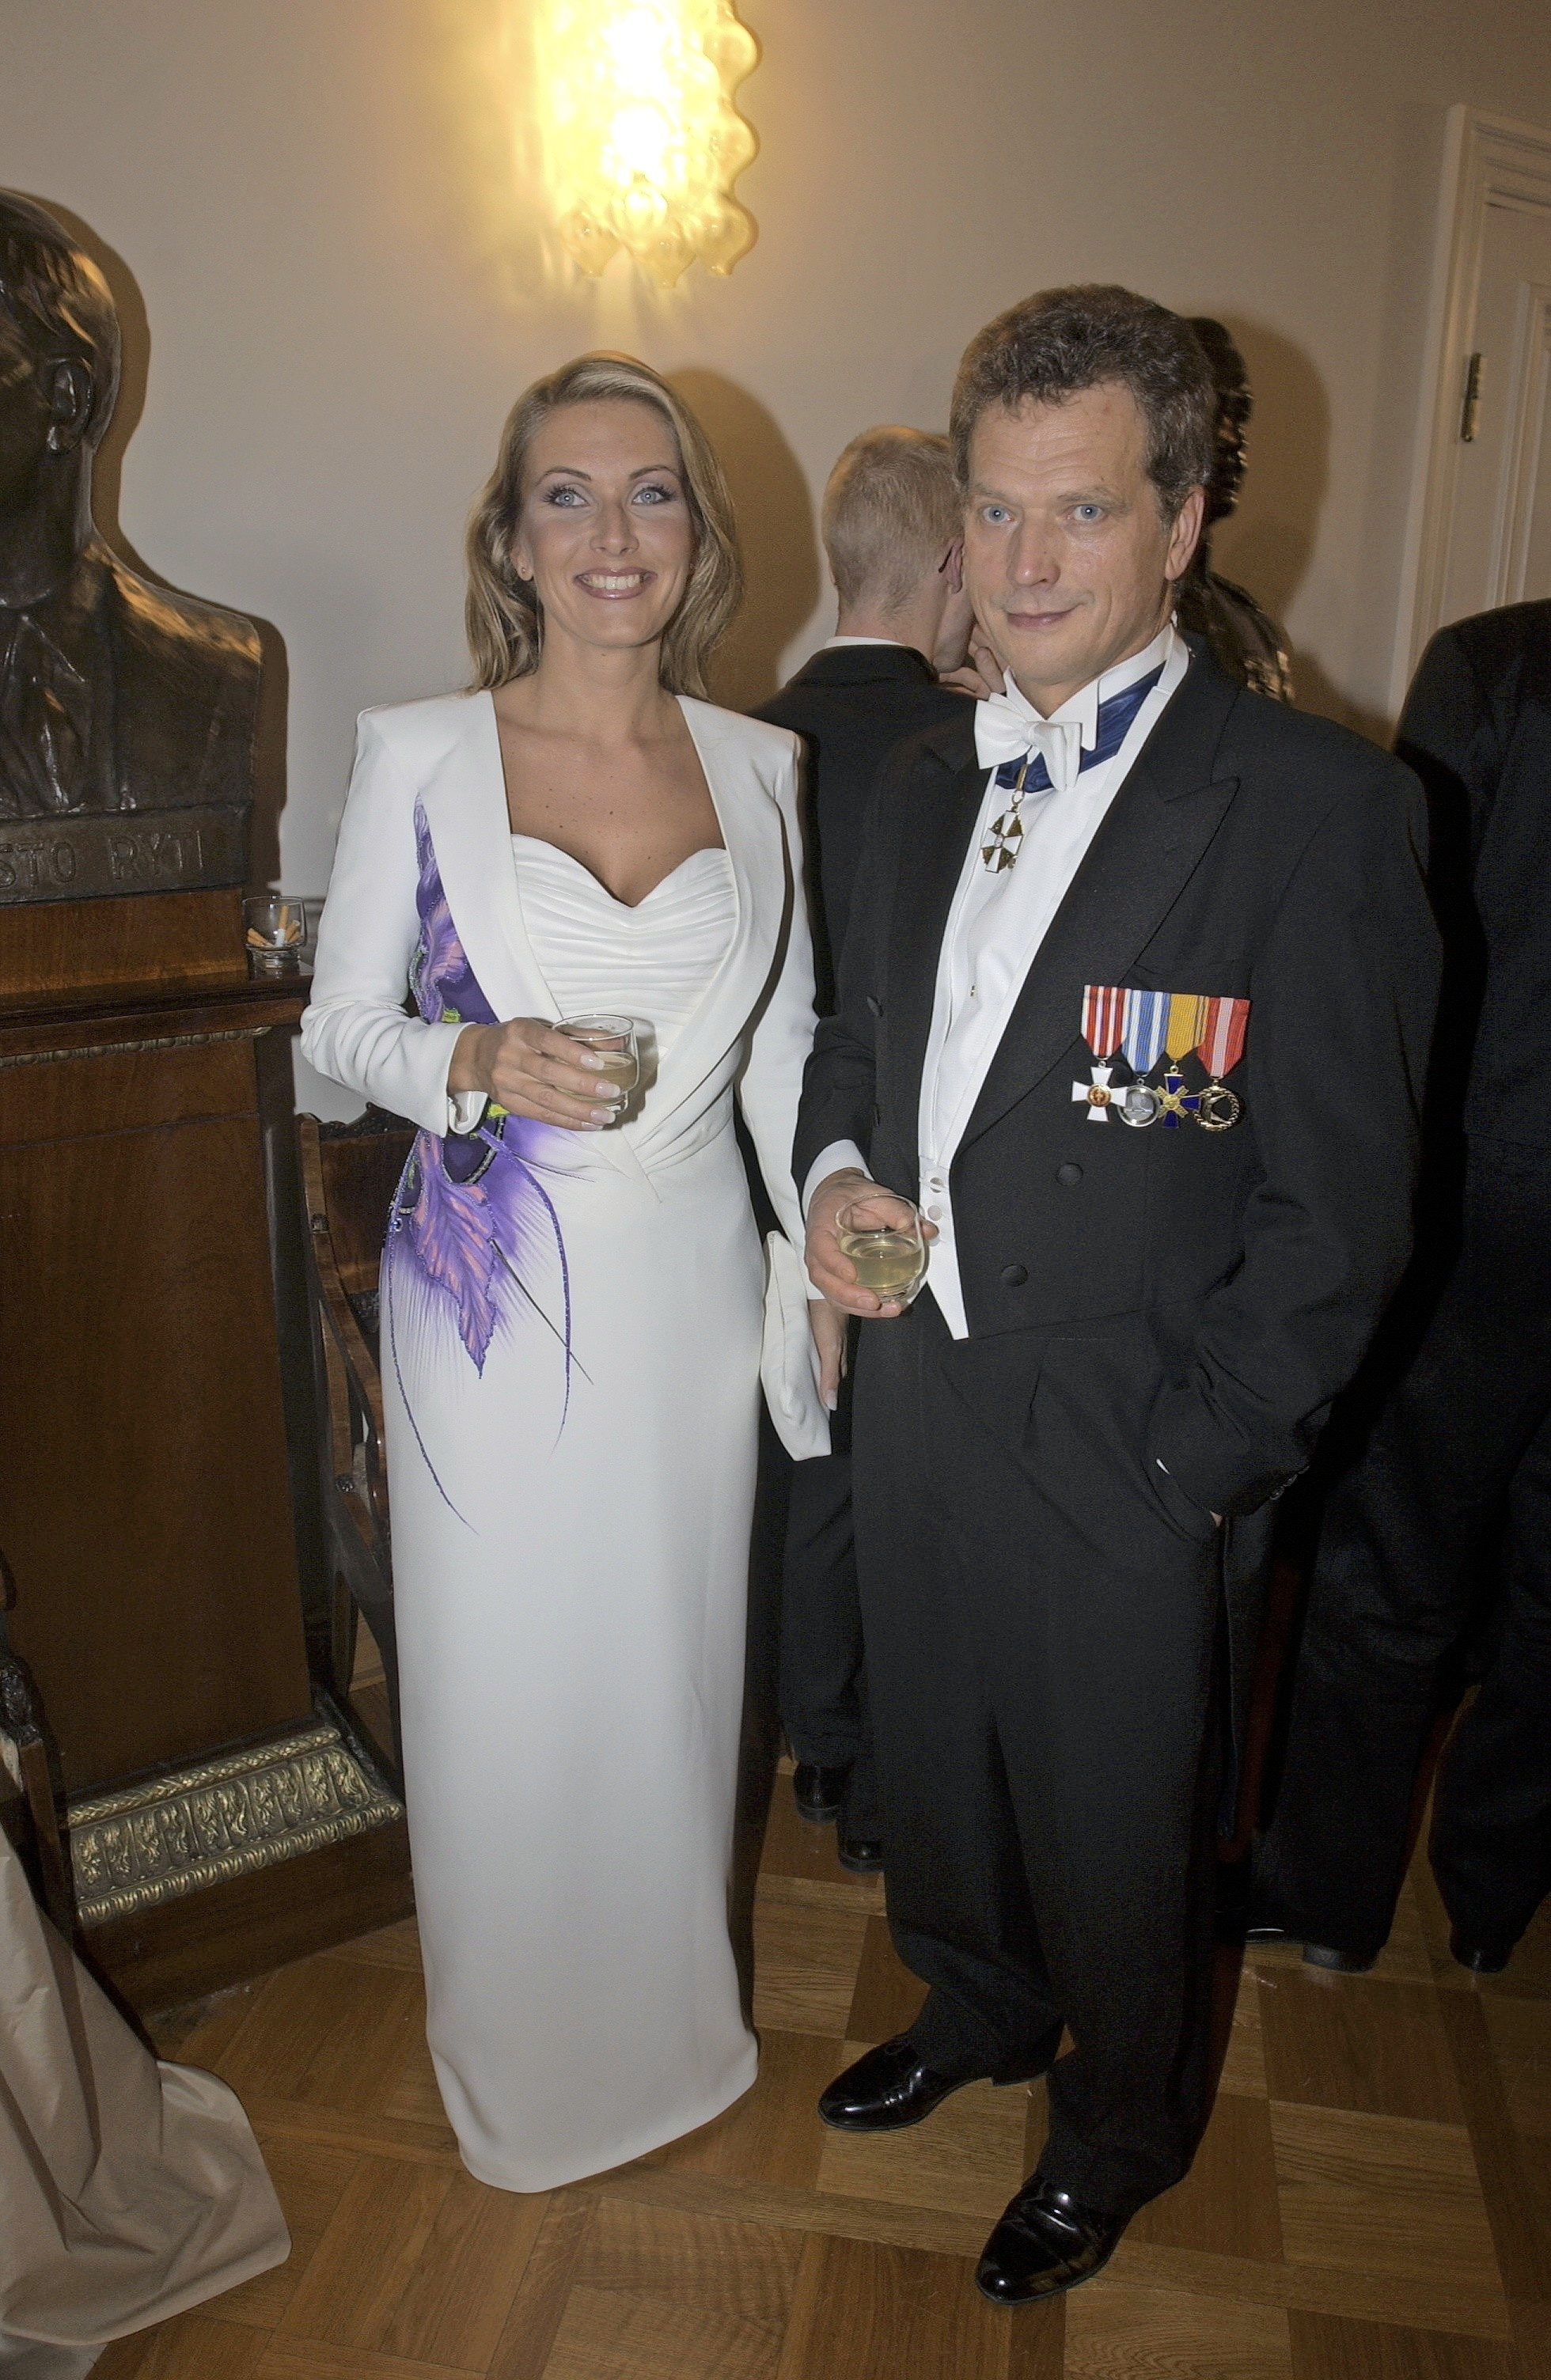 Tanja Karpela ja valtiovarainministeri Sauli Niinistö olivat Linnan juhlien kuvatuin pariskunta vuonna 2001.